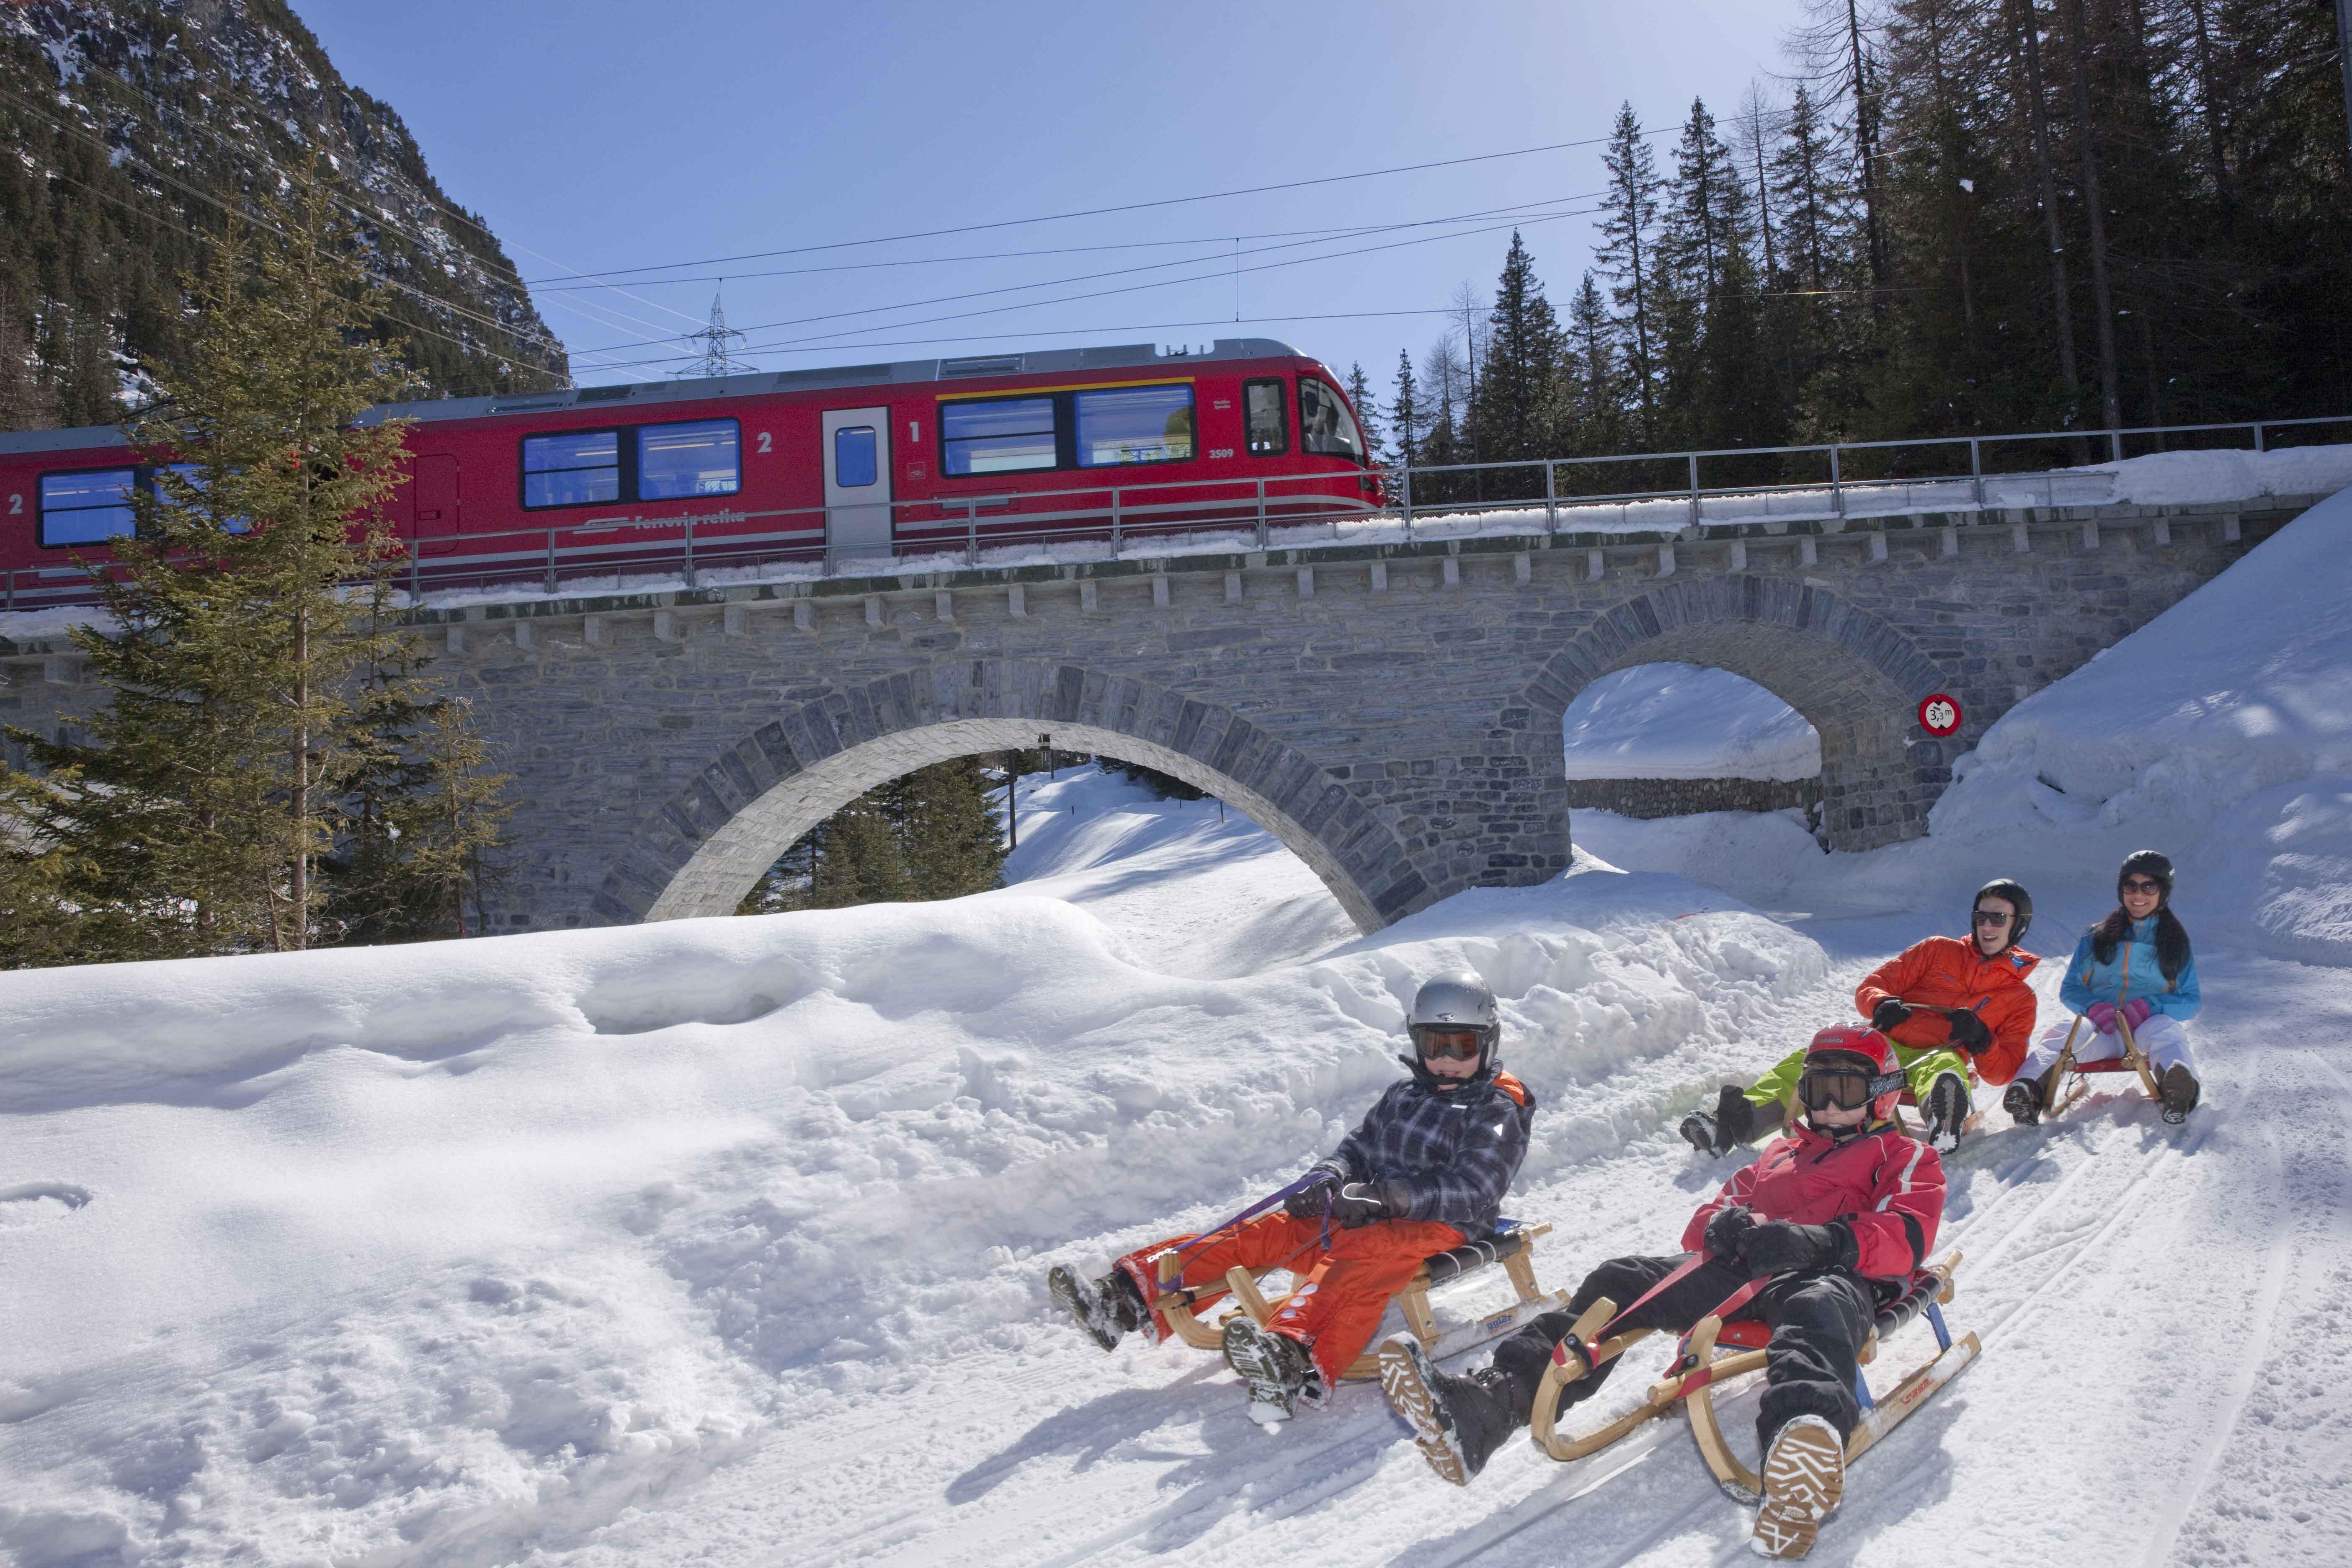 Twisting toboggan adventure from Preda to Bergün